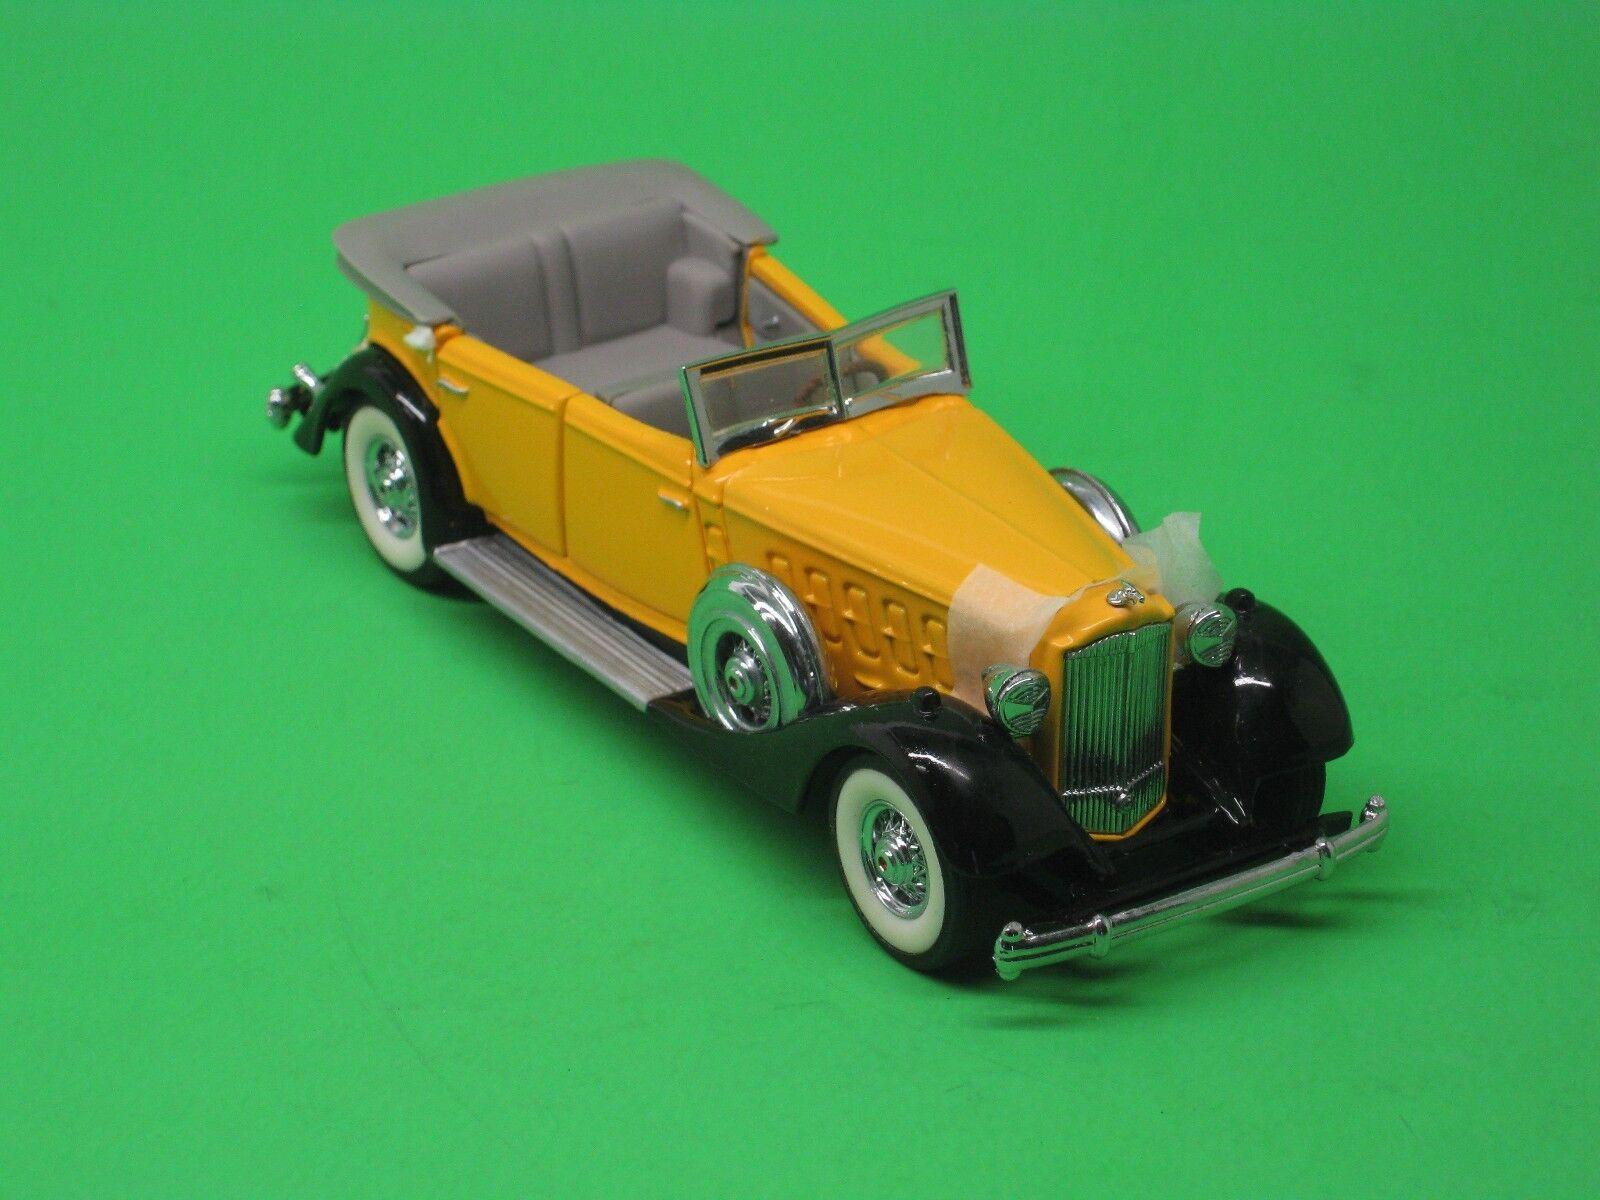 deportes calientes Packard converdeible 1934 amarillo franklin franklin franklin mint 1 43 Precision models b11rb75  te hará satisfecho